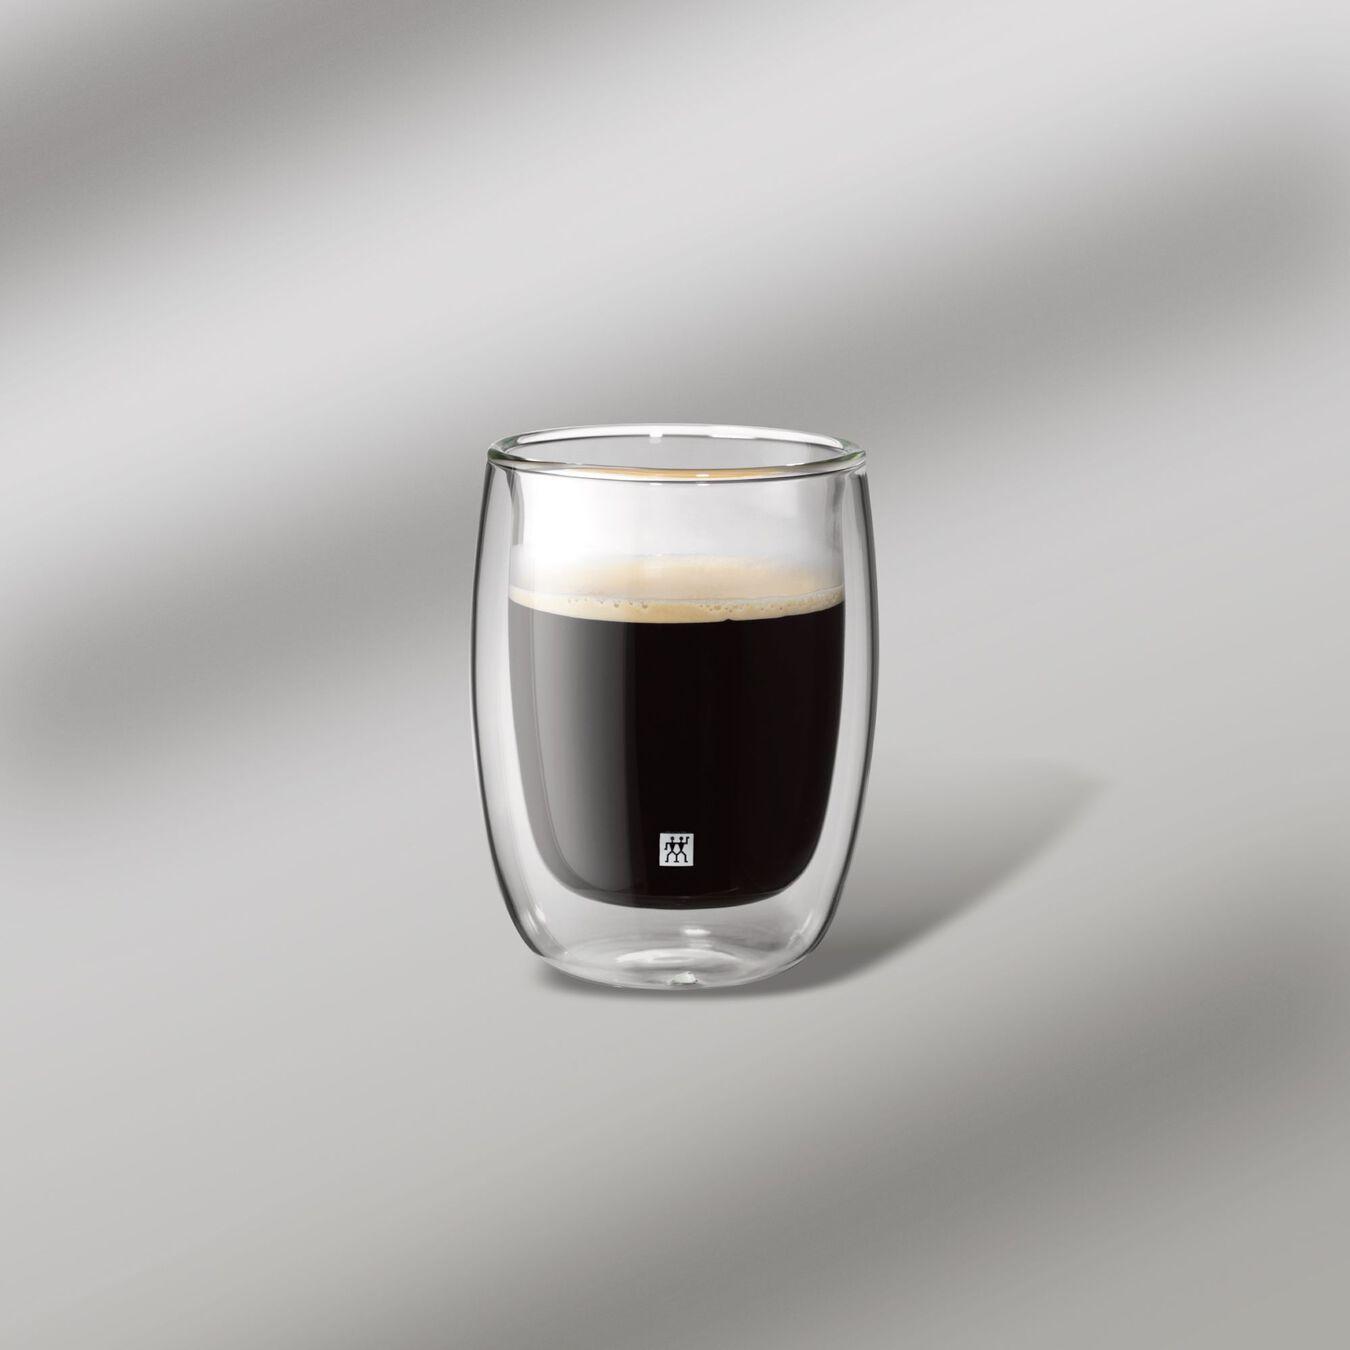 2 Piece Coffee glass set,,large 4